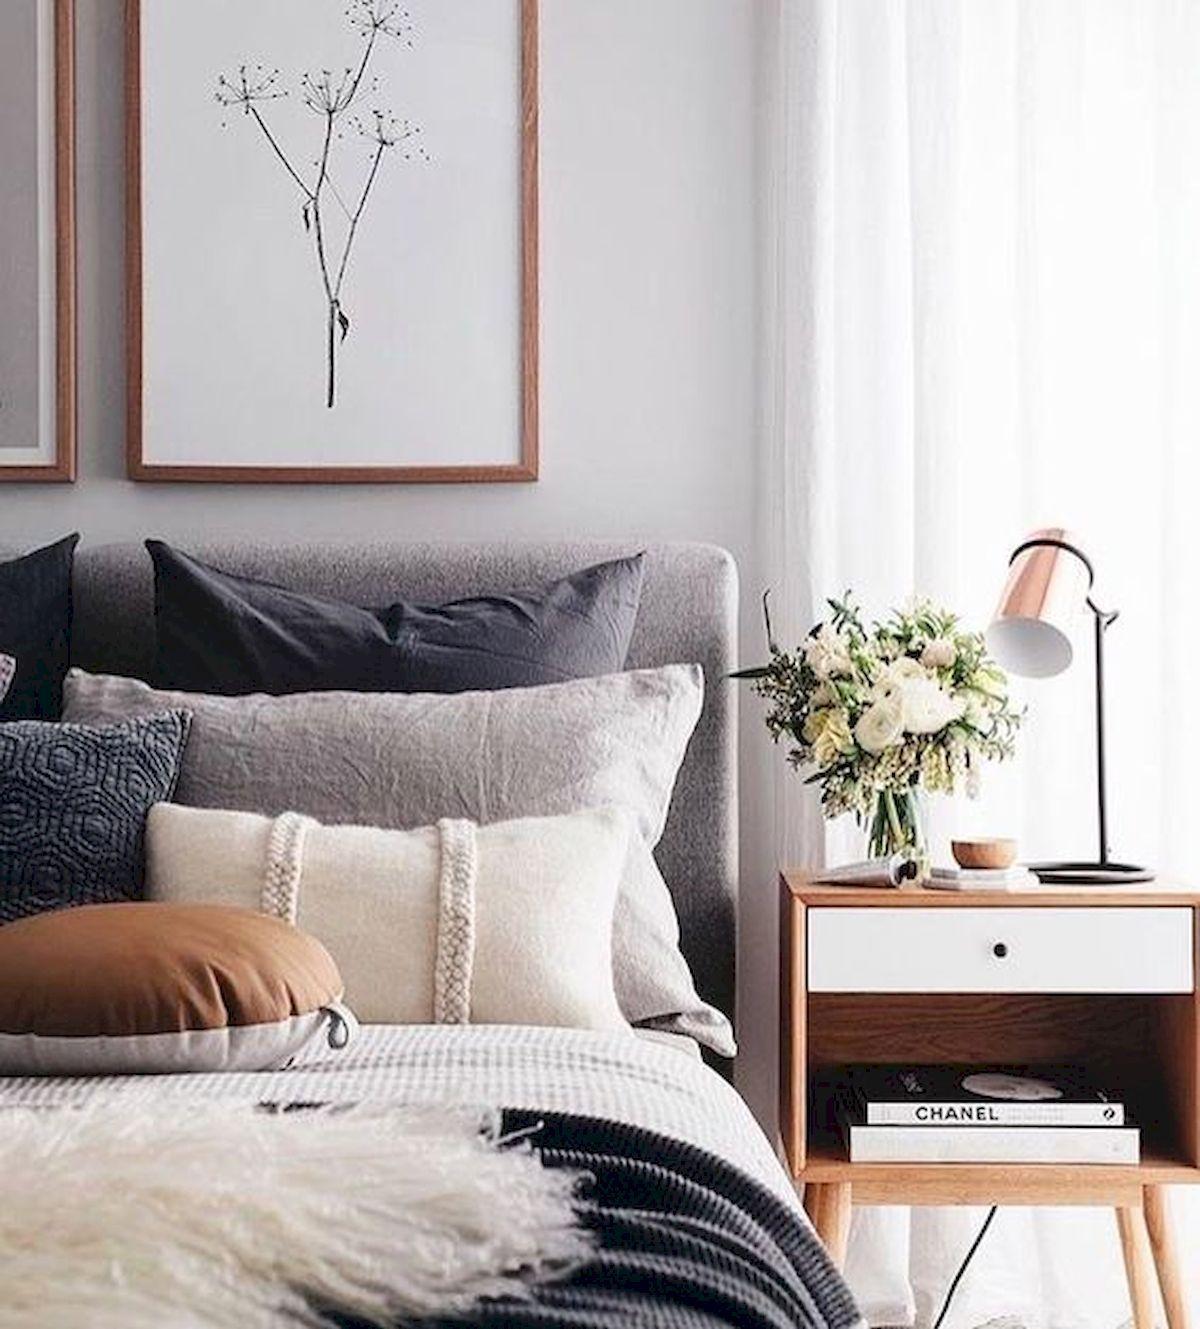 Scandinavian Bedroom Curtains Bedroom Chandeliers Menards Bedroom Athletics Mule Slippers Bedroom Colour Combination: 60 Best Farmhouse Bedroom Furniture Design Ideas And Decor